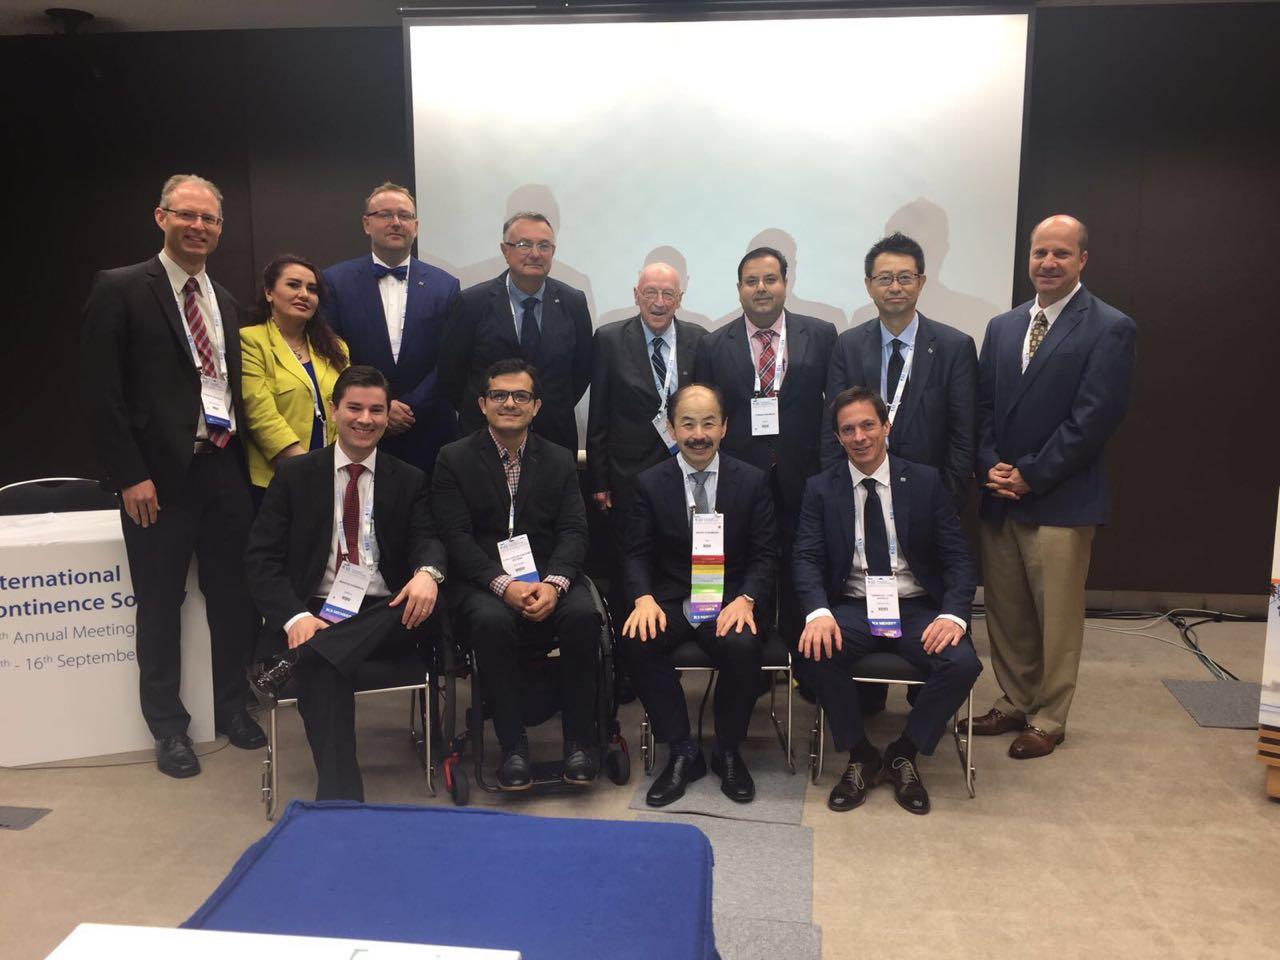 International Continence Society, INUS session. Tokio, Japan. 2016